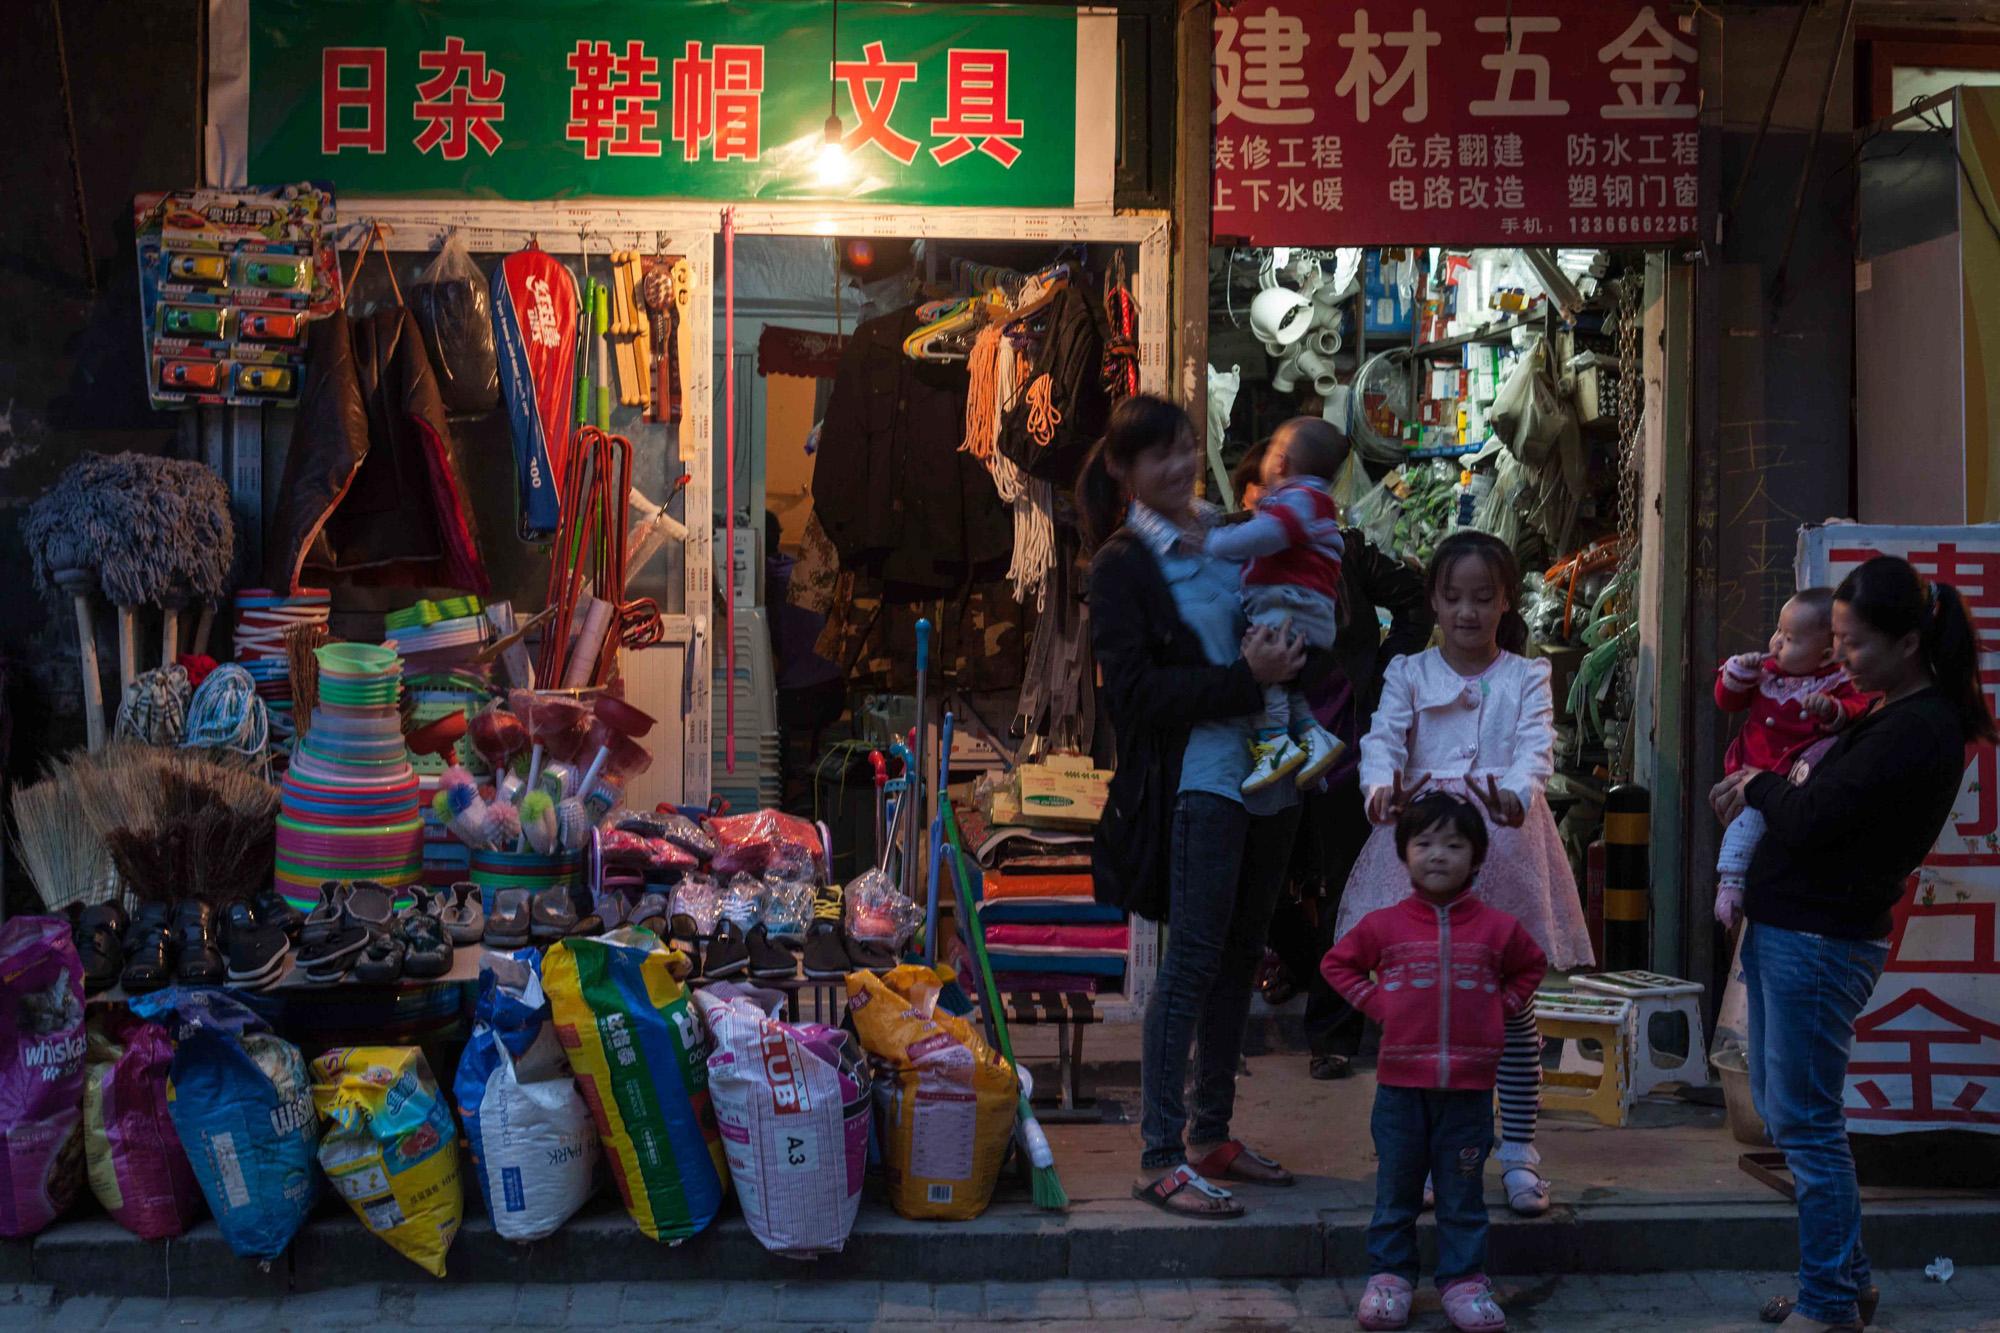 © Stefanie Thiedig 由甲, Kulturgut 文化财富, www.kulturgut-china.de